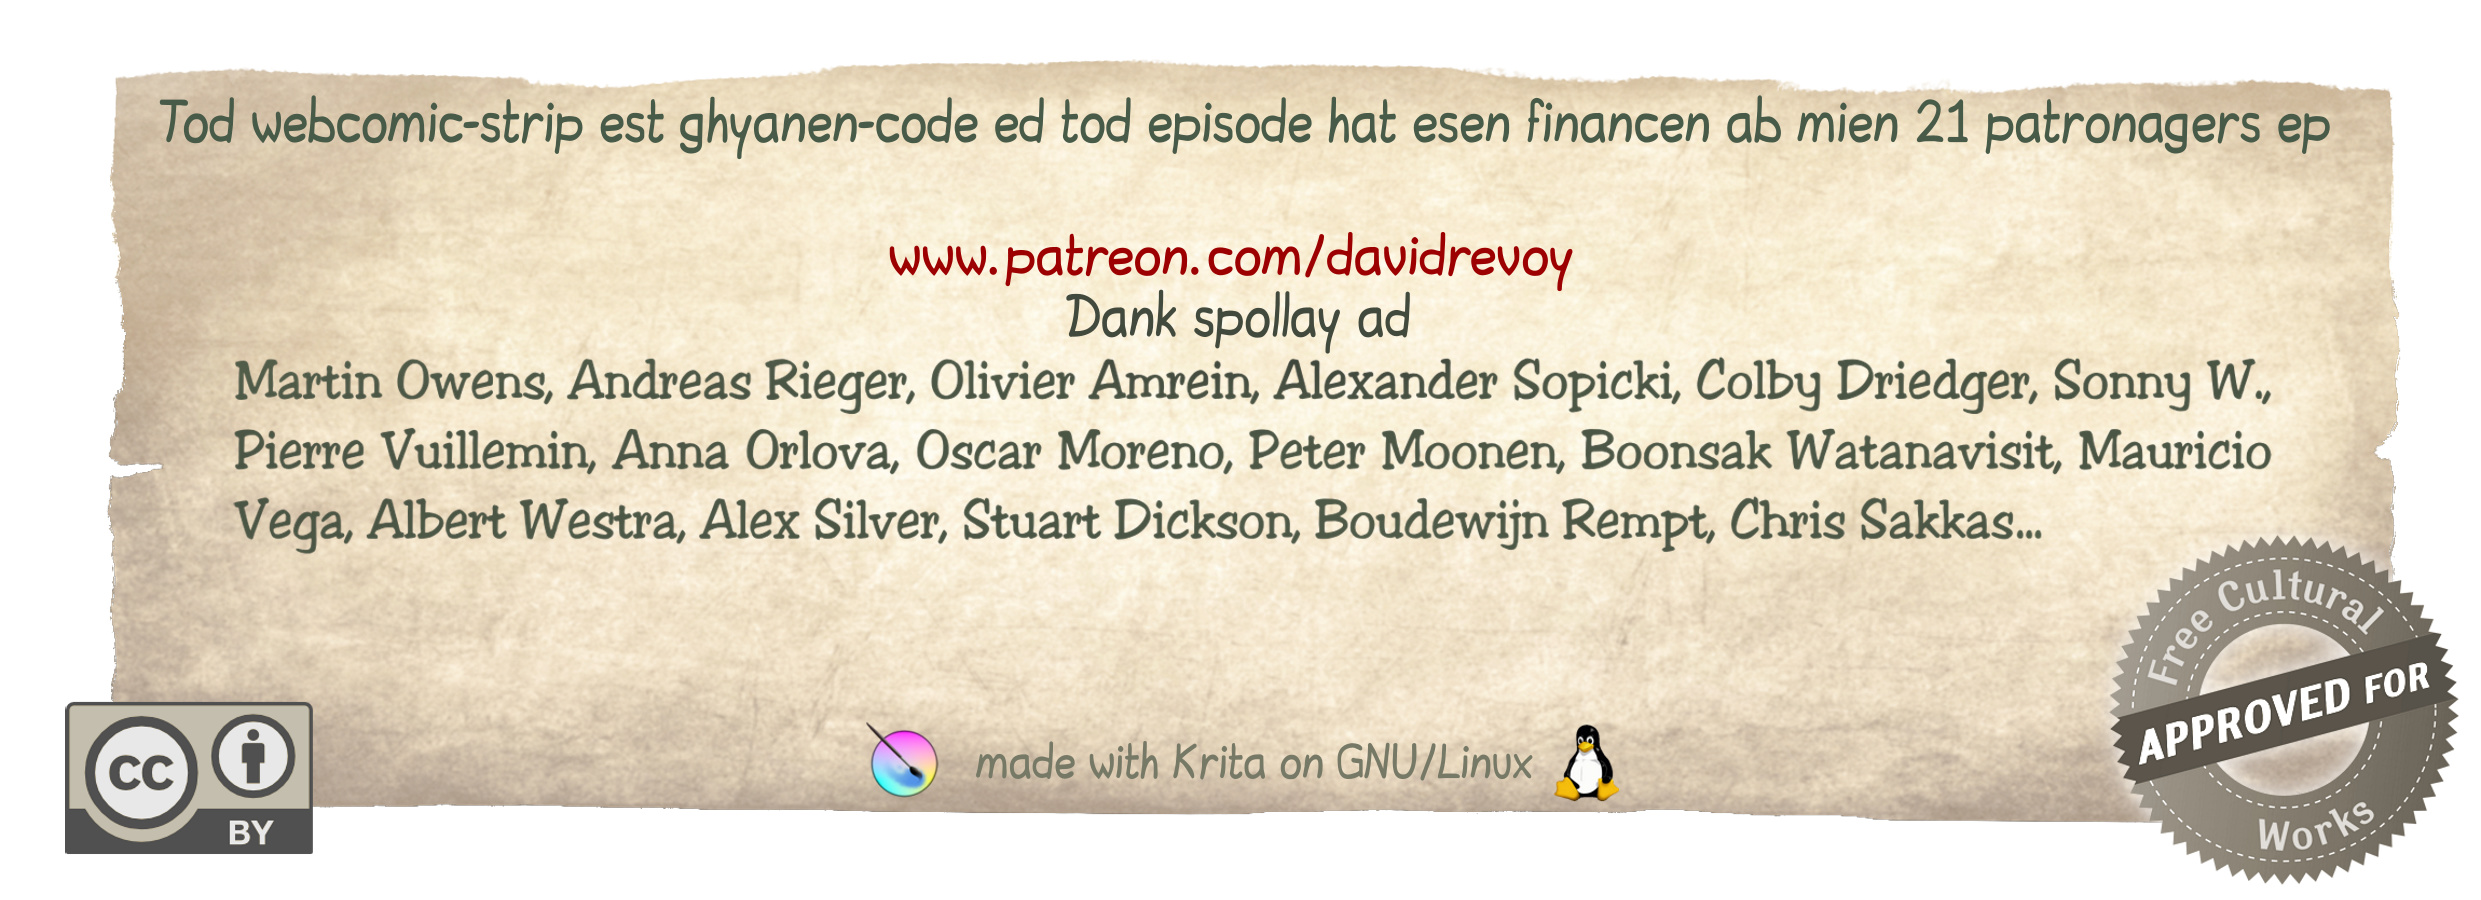 Episode 2: Ia Deuspontpotions, Page 6